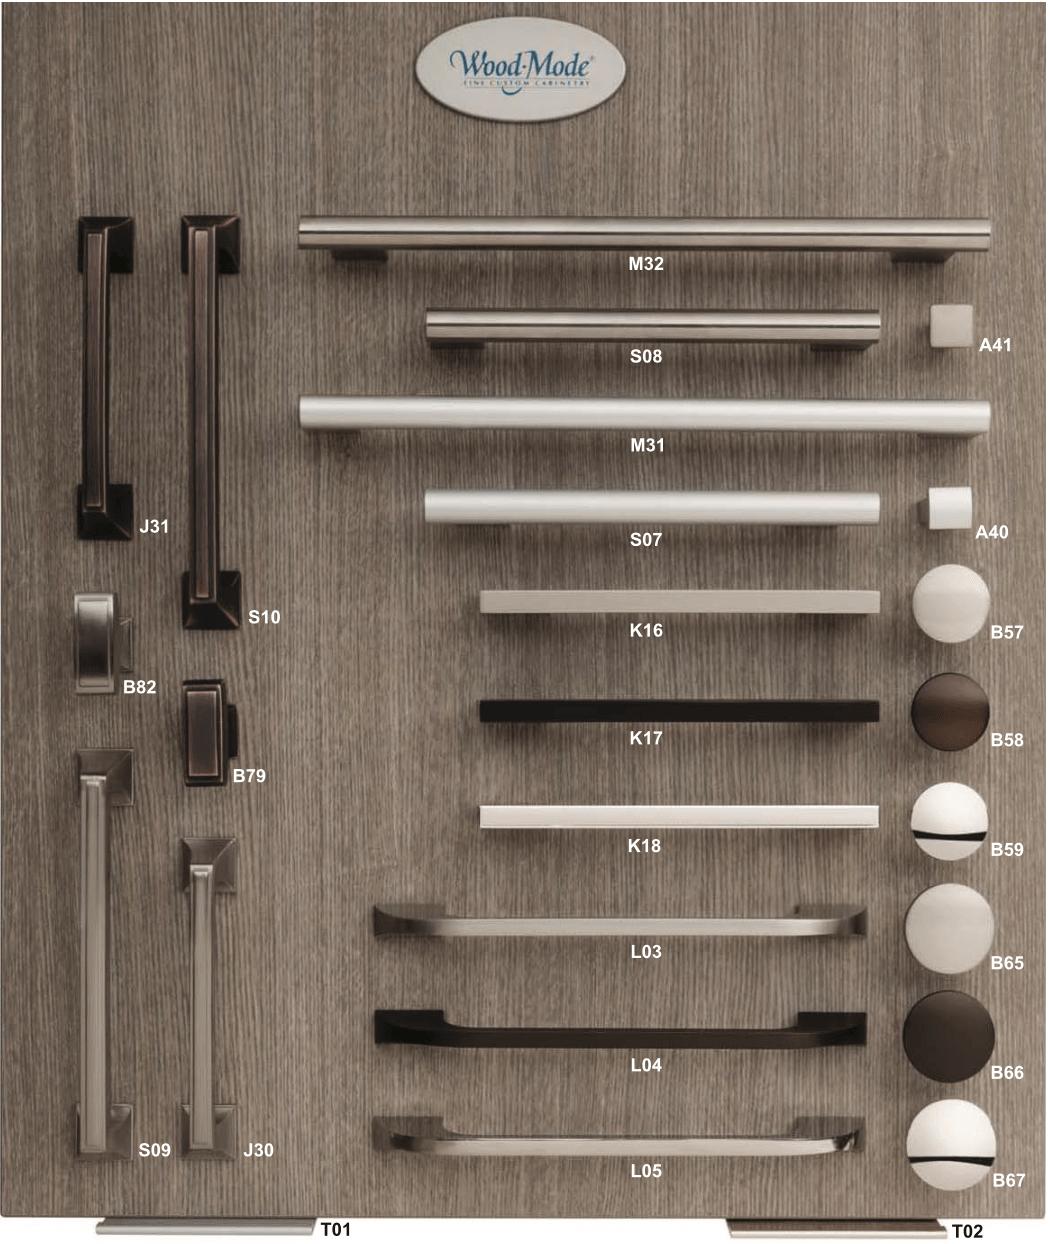 wood mode brookhaven hardware kitchen cabinets hardware Wood Mode Brookhaven Hardware Kitchen Associates 3